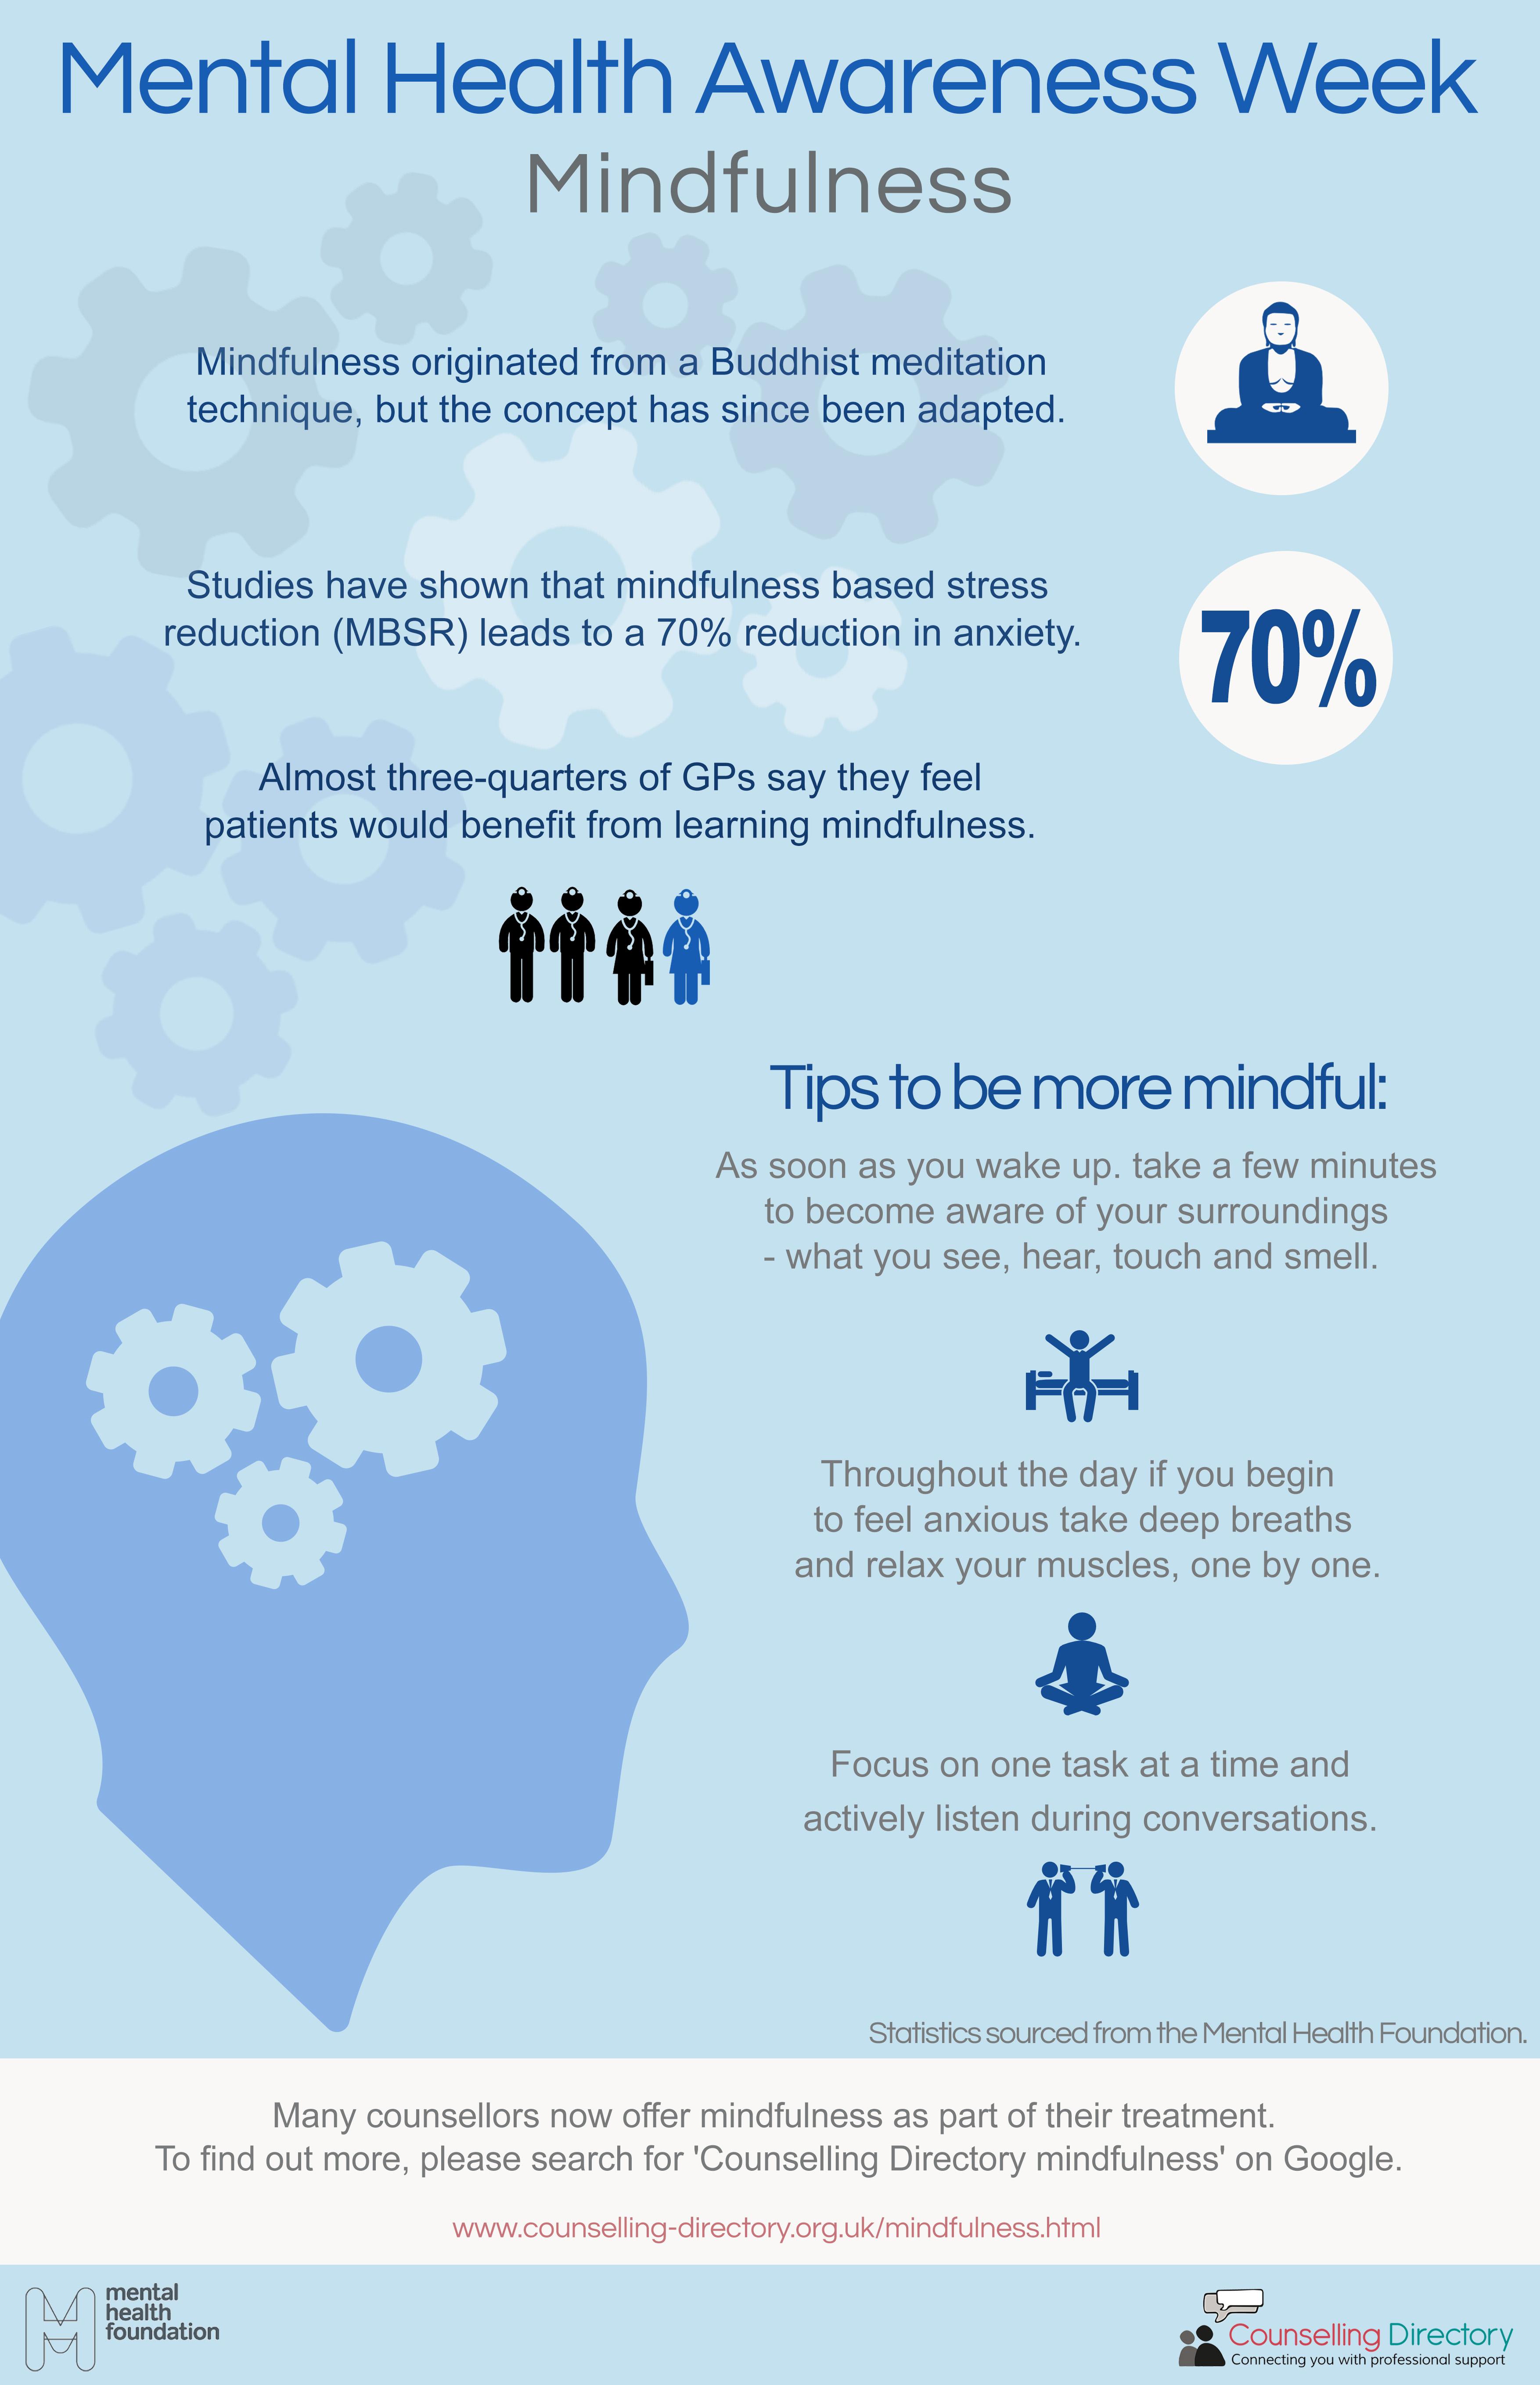 Mental Health Awareness Week Infographic